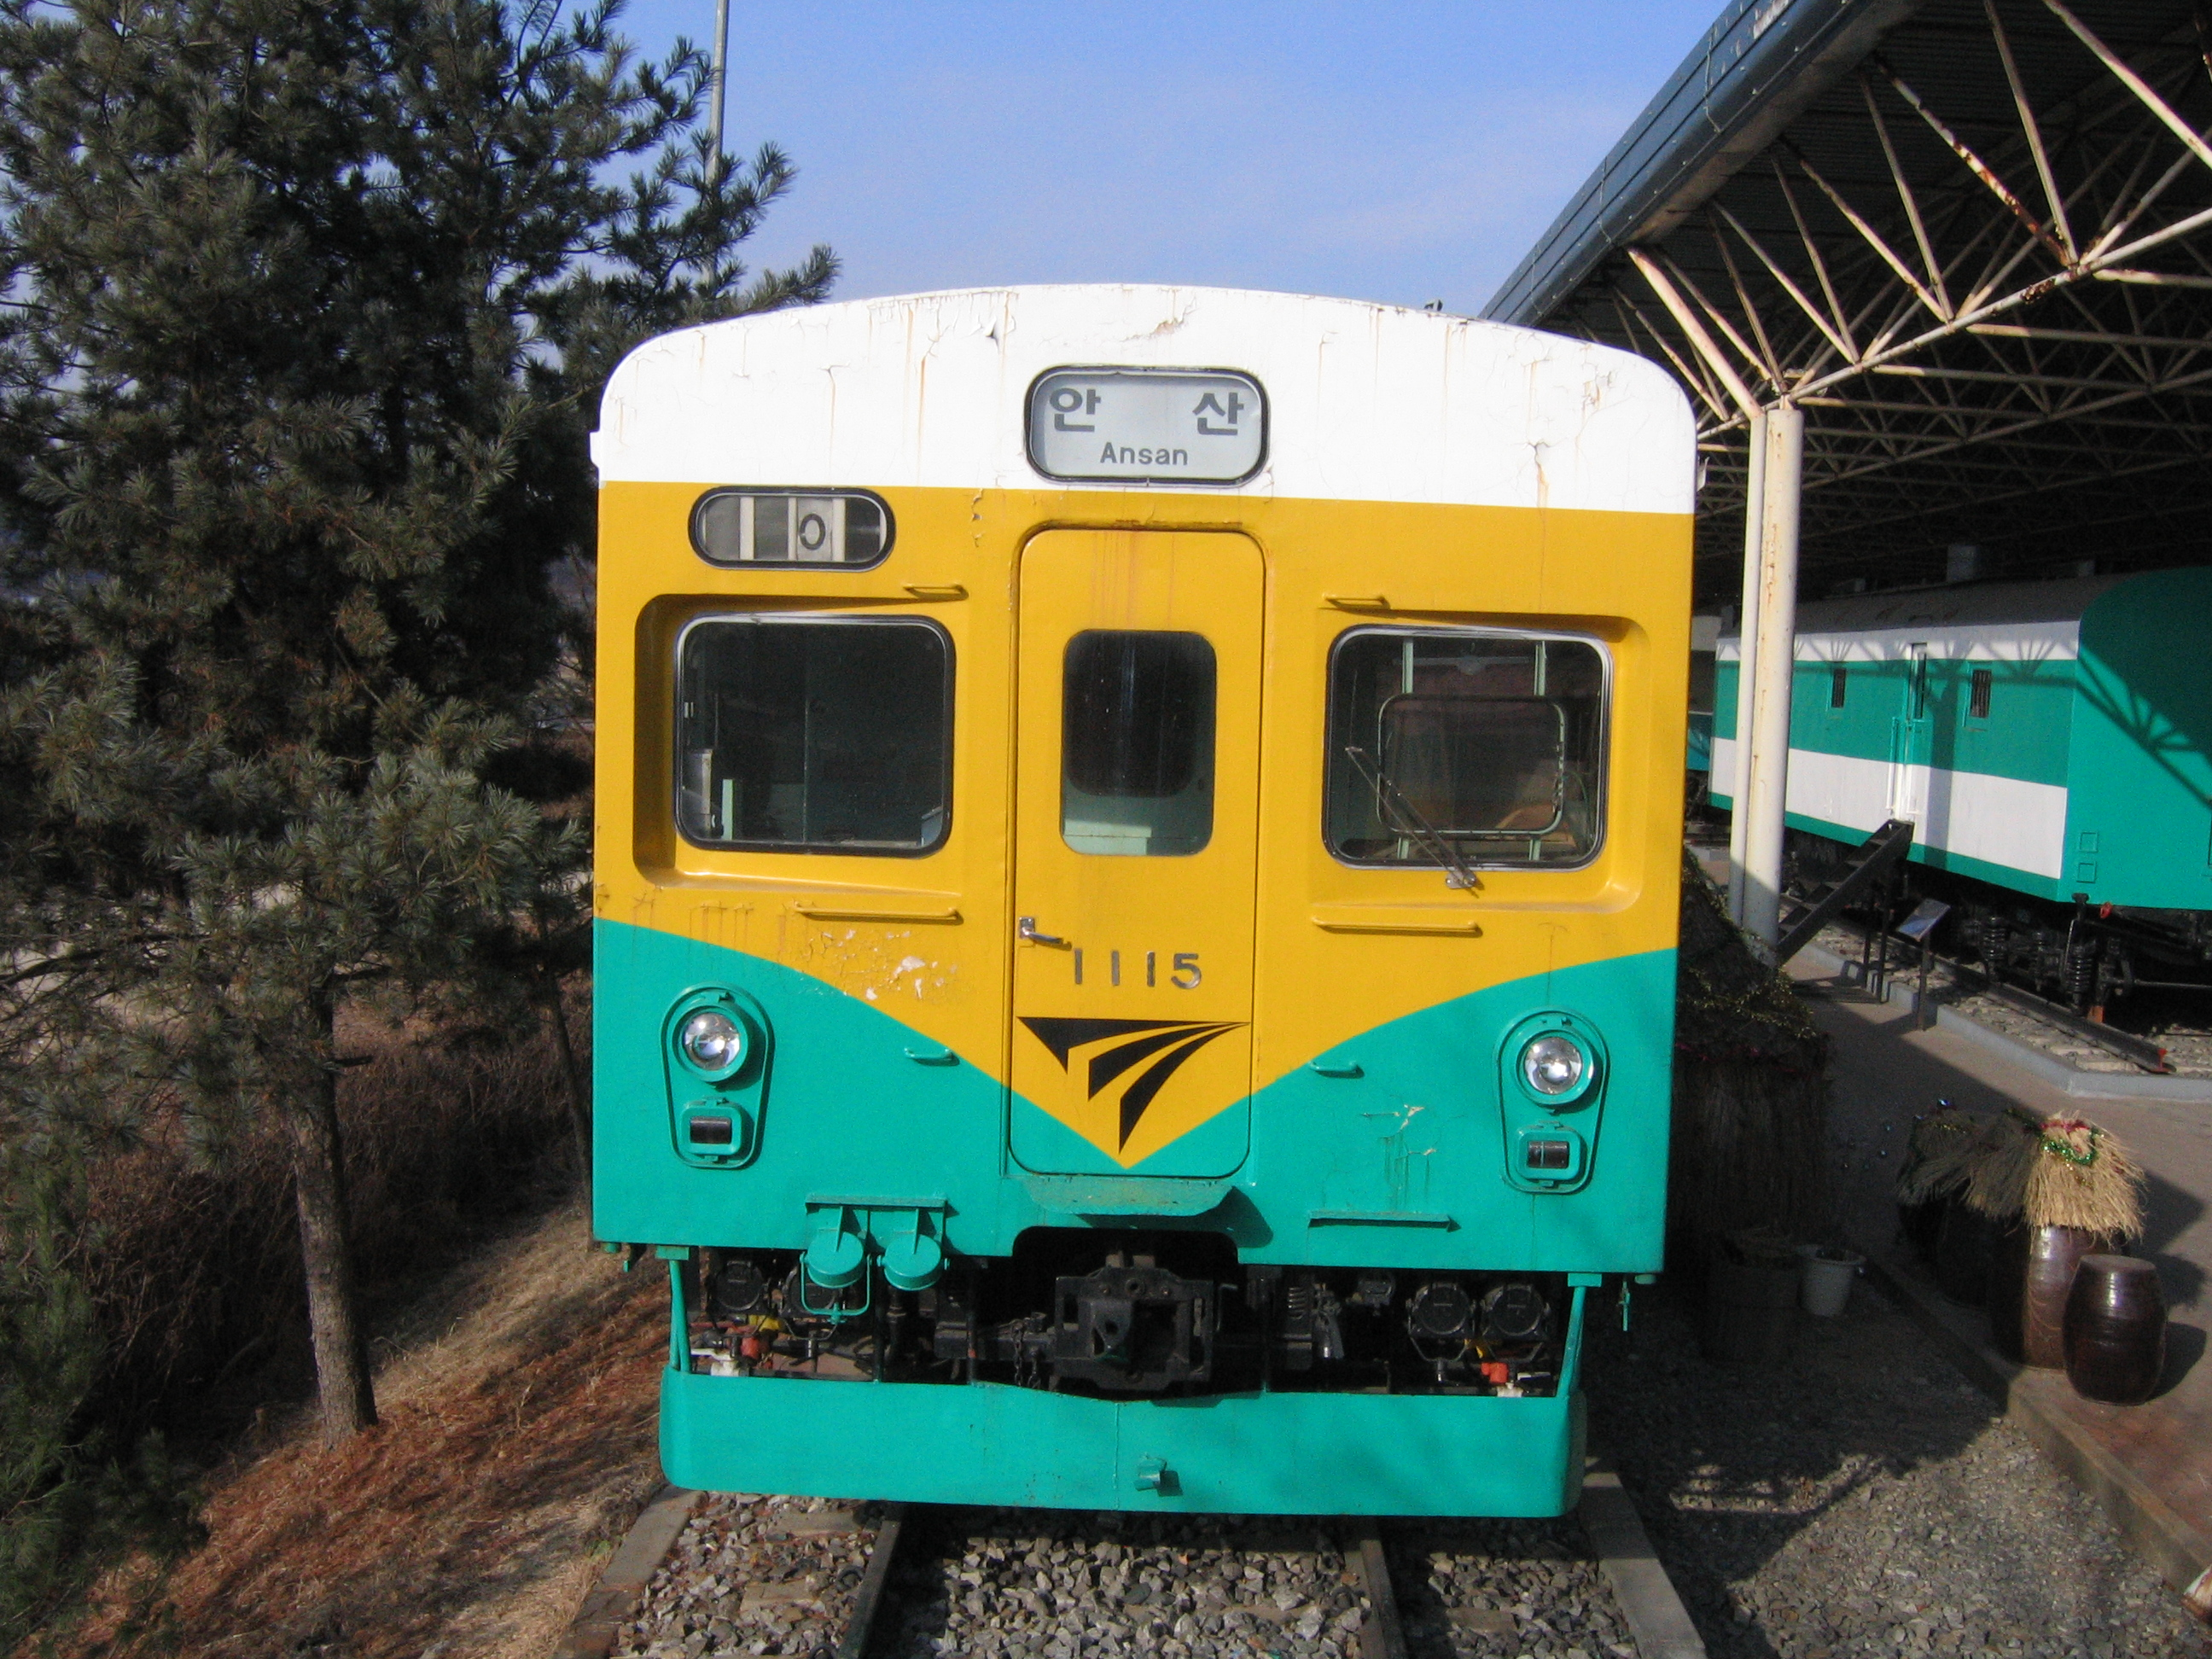 File:Korail 1115 preserved in railroad museum.jpg